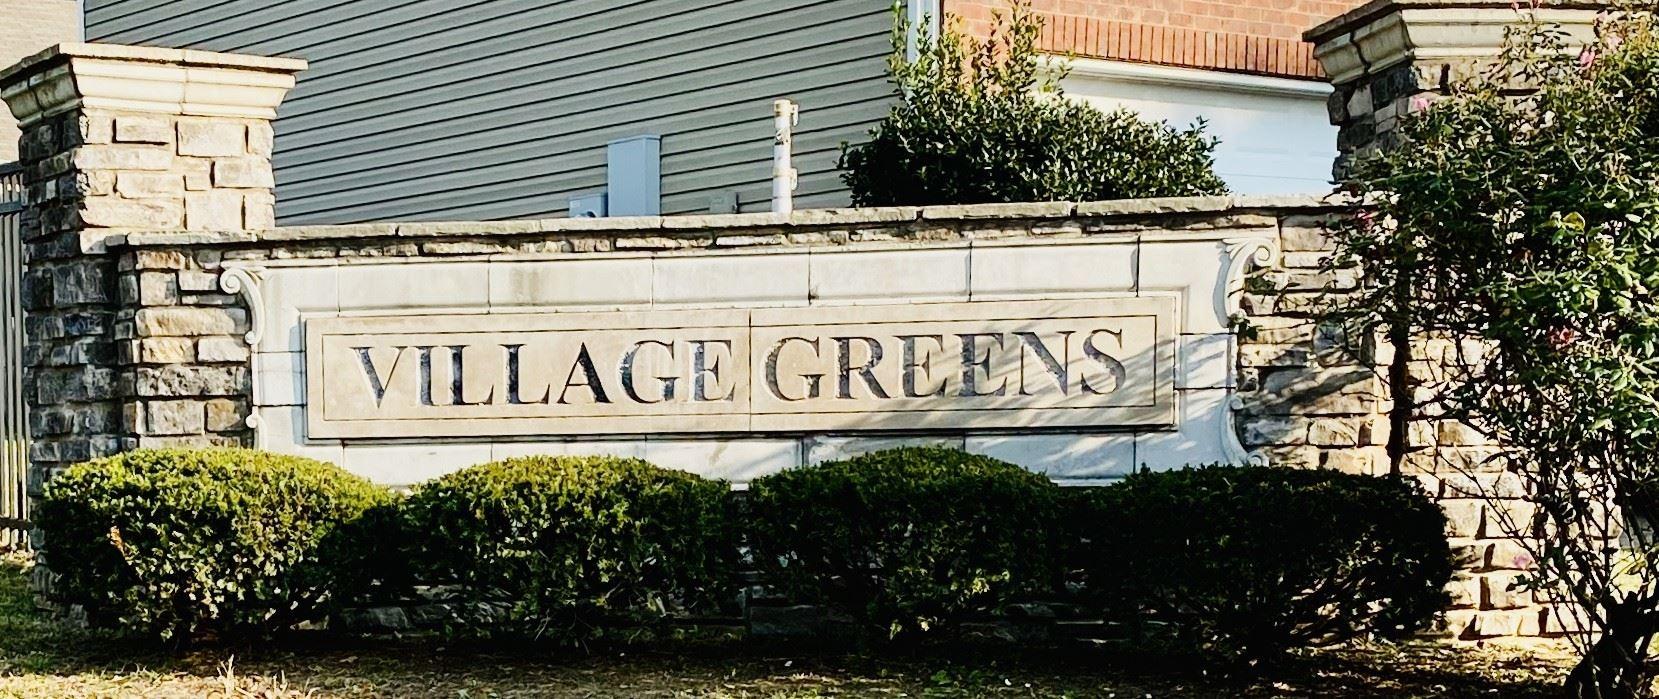 492 Golf Club Lane, Springfield, TN 37172 - MLS#: 2242548